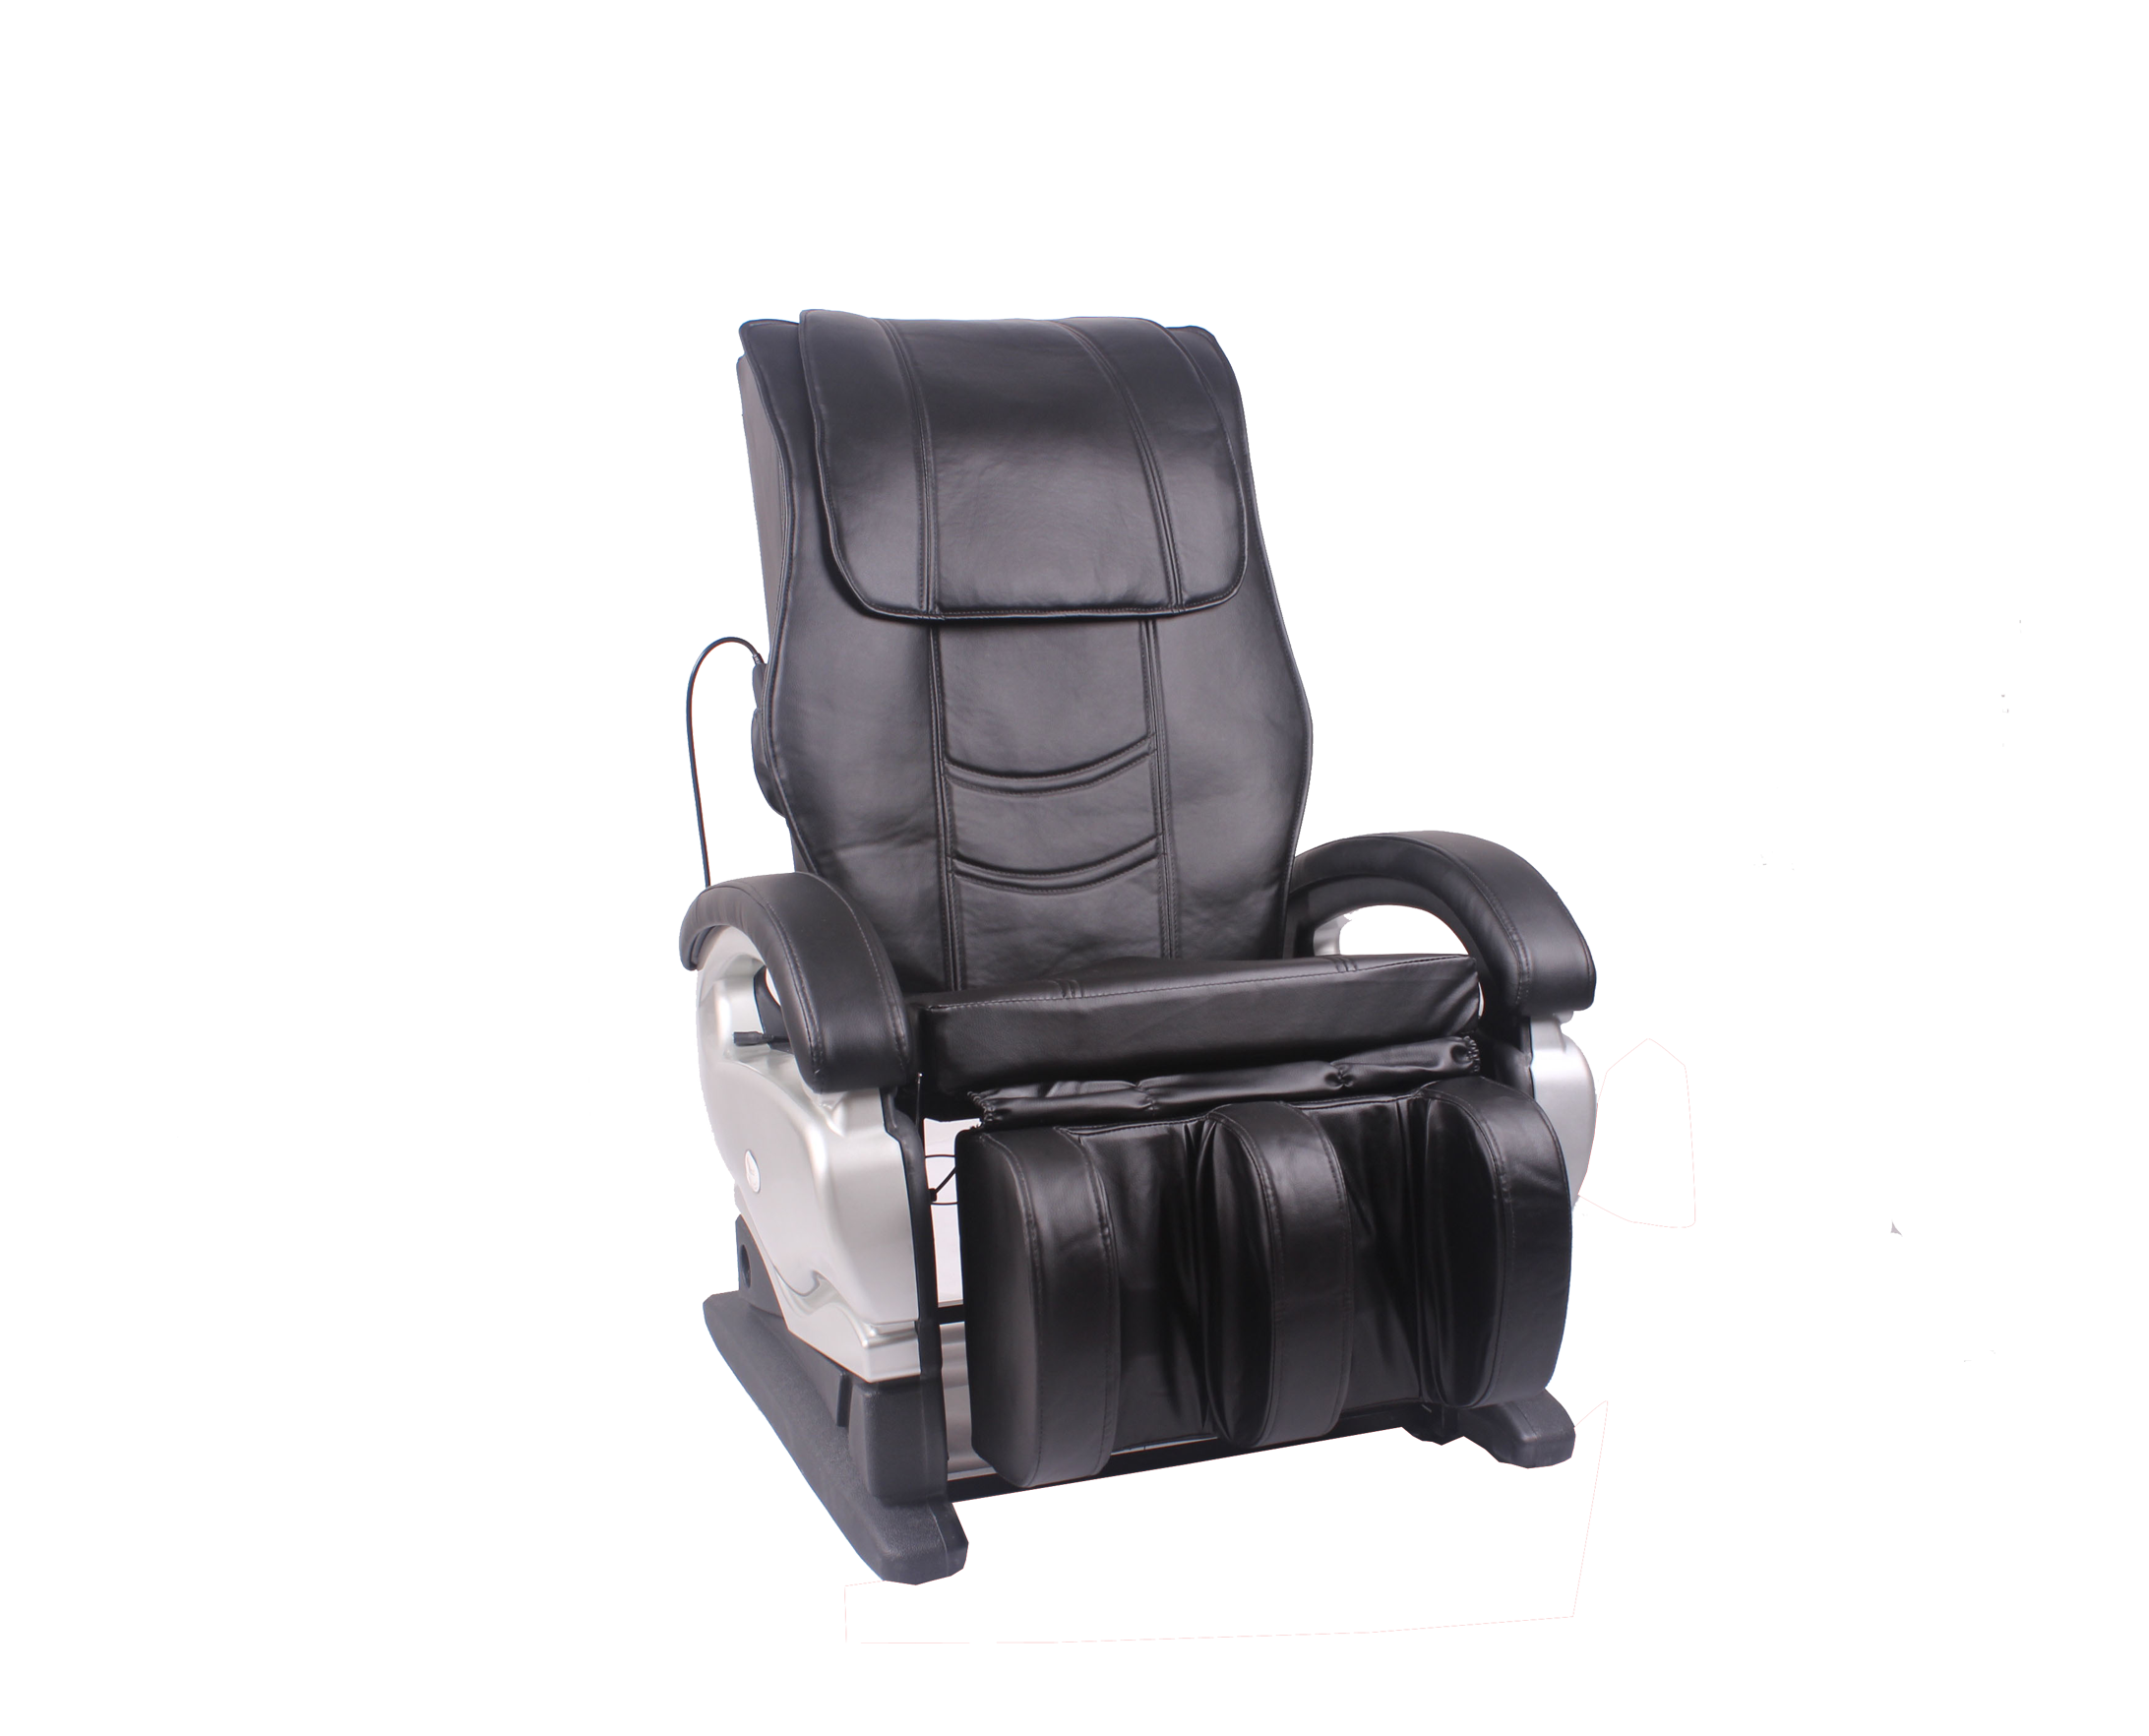 M bo Electric Full Body Shiatsu PU Leather Massage Chair